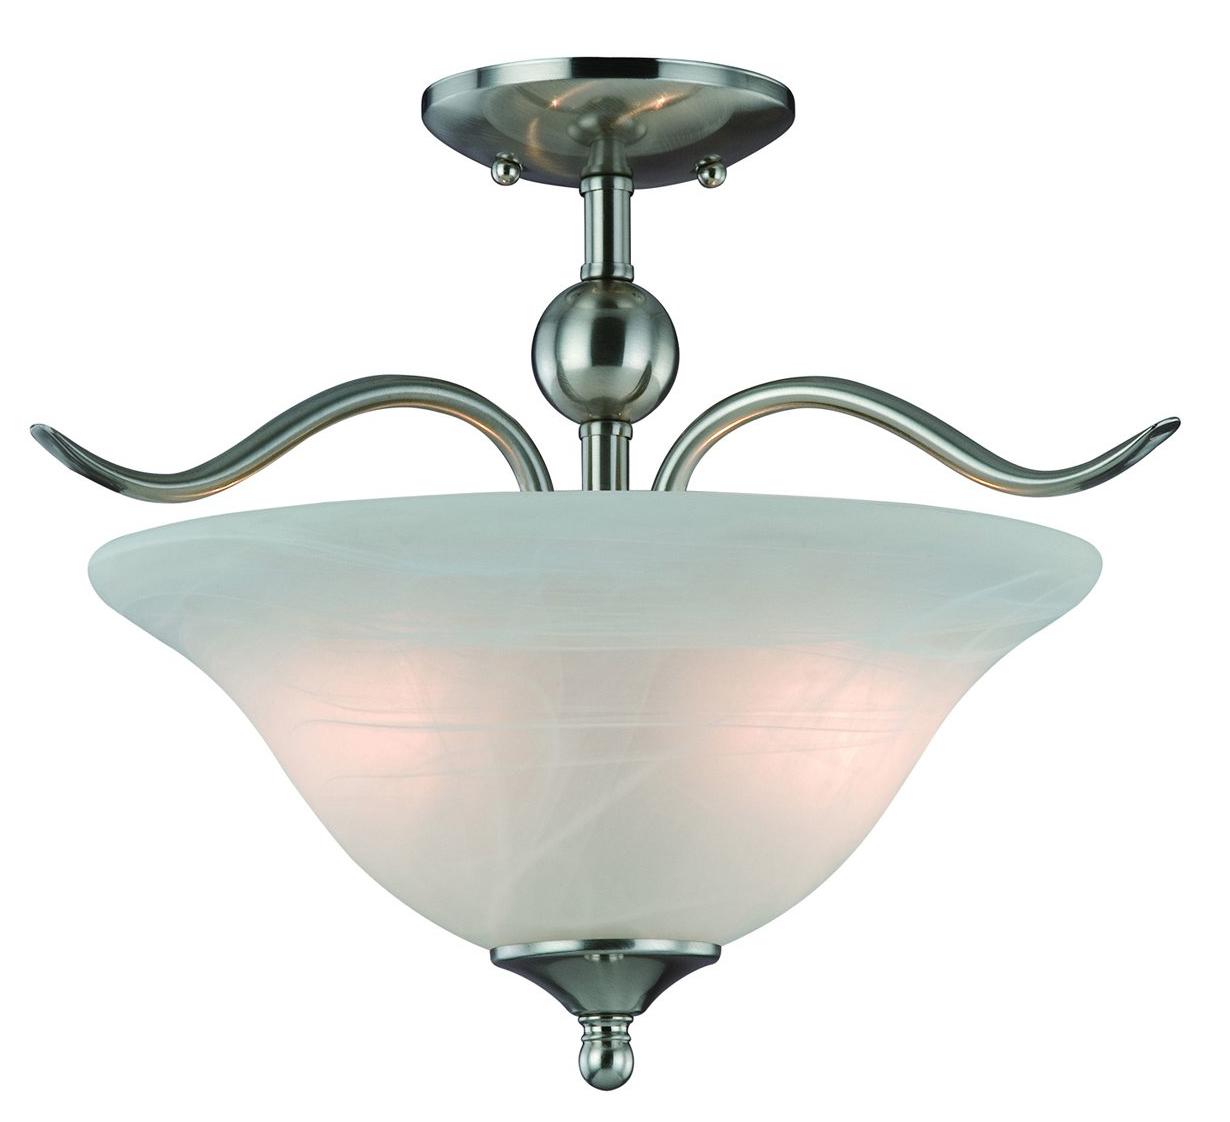 10-4289 Satin Nickel 2-Light Semiflush Light